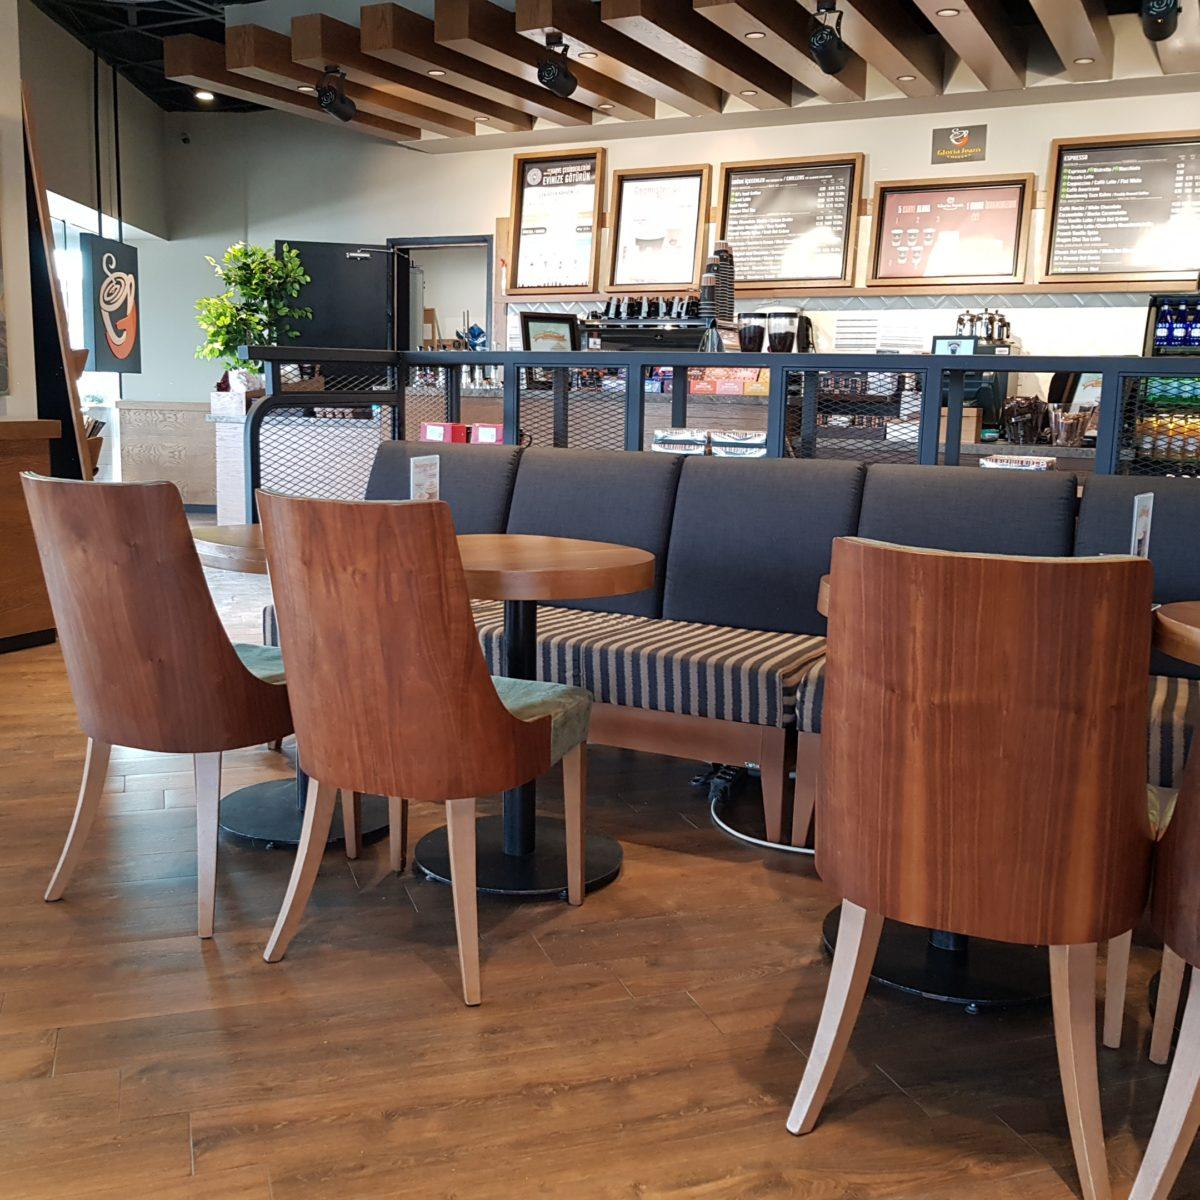 cafe furniture by seatupturkey